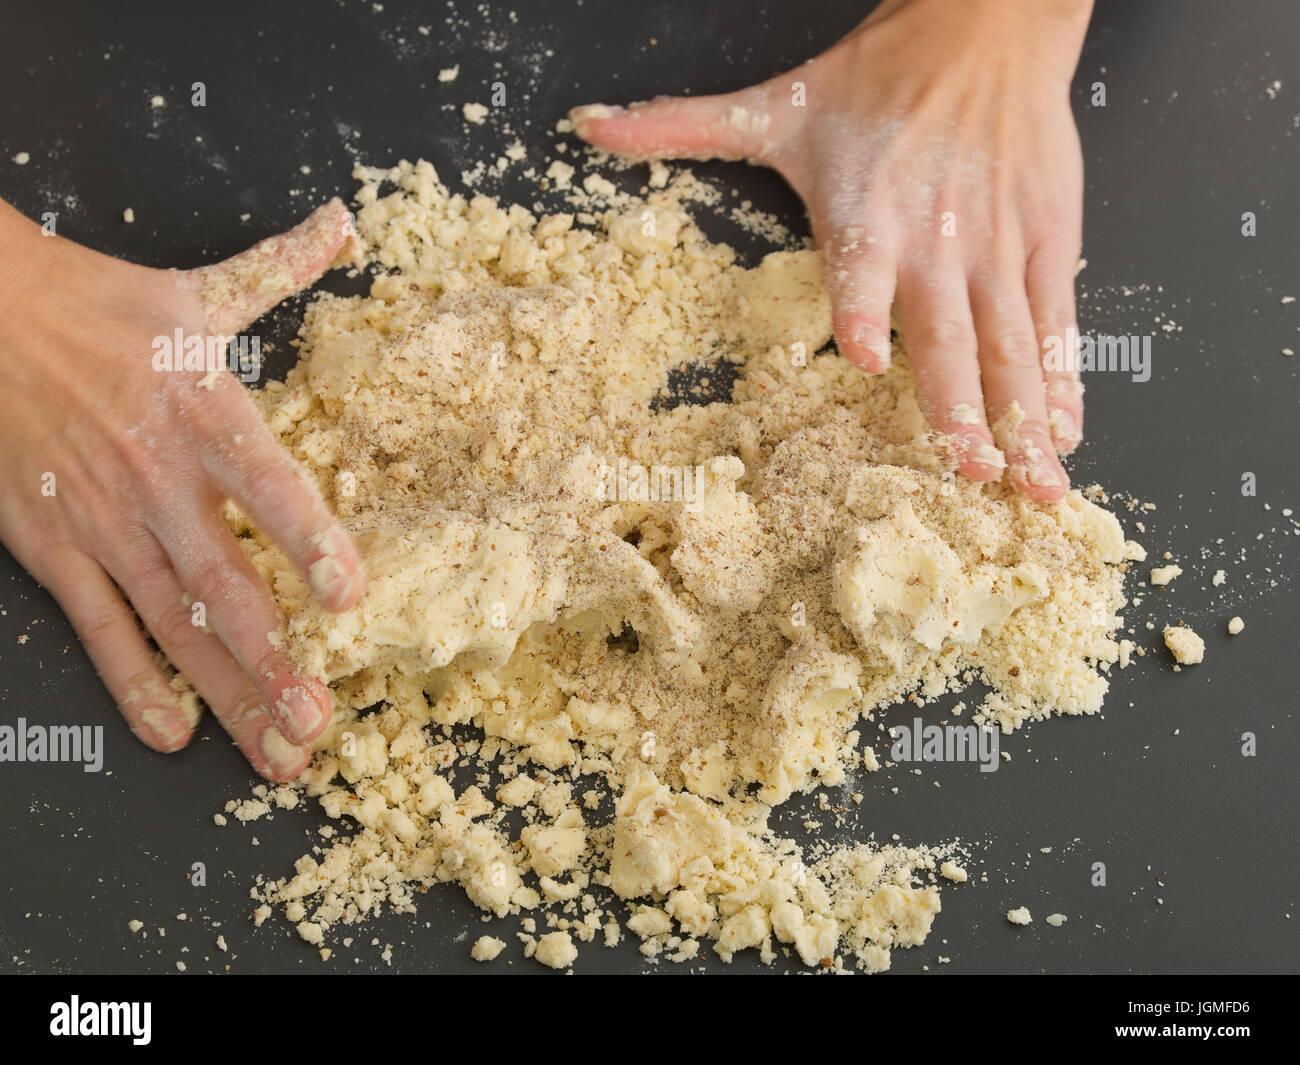 Woman kneads a dough from - Woman is baking, Frau knetet einen Teig ab - Woman is baking Stock Photo